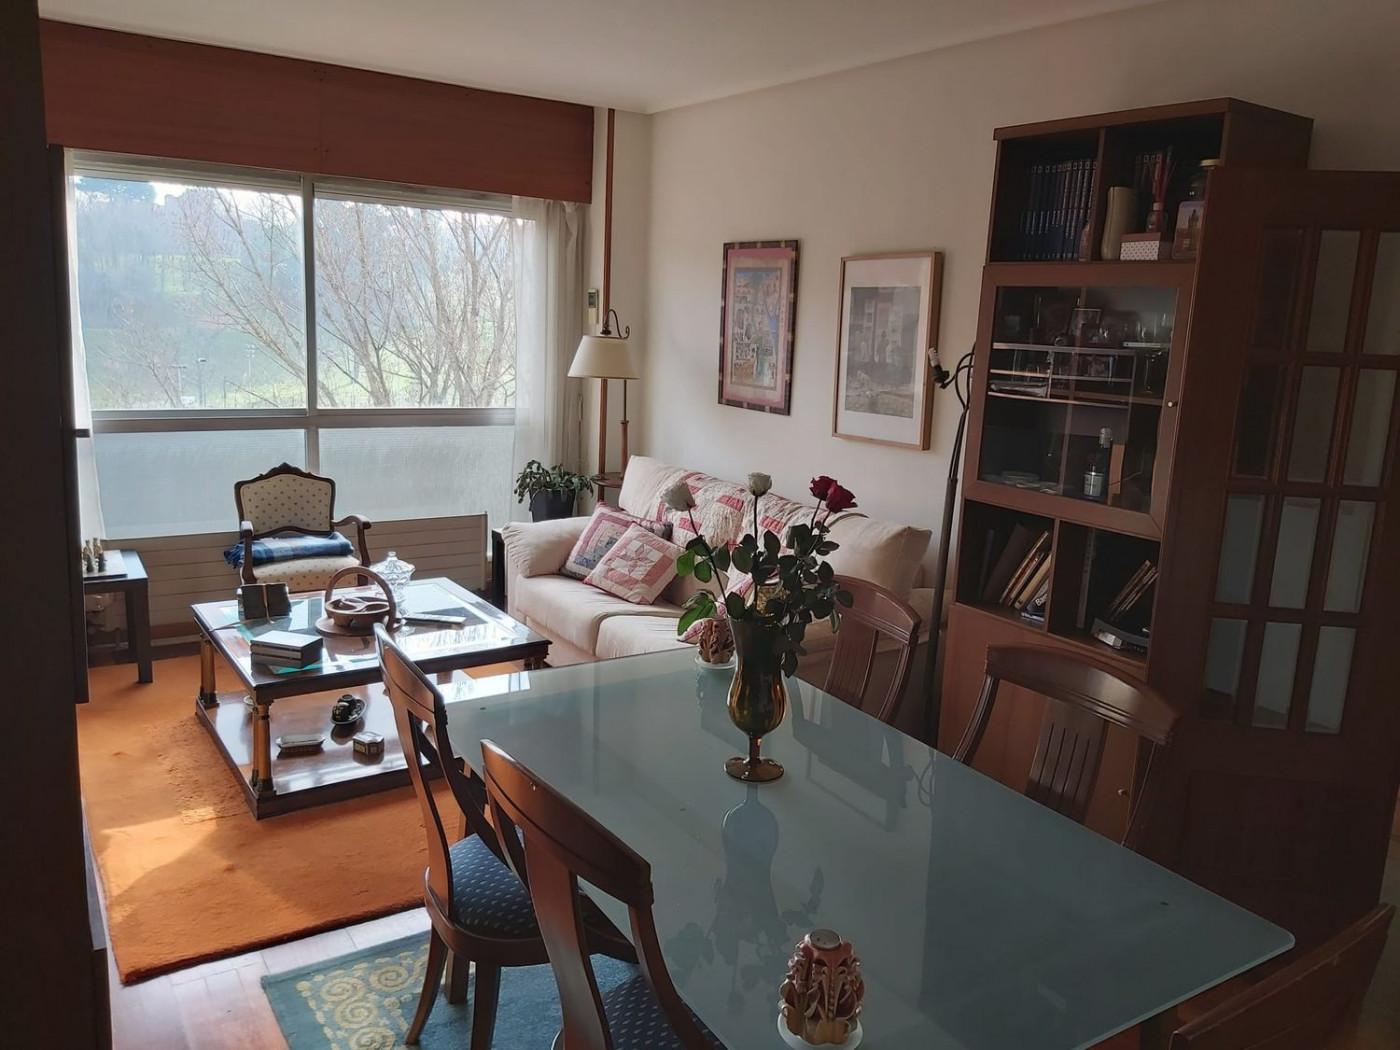 Flat for sale in LAS ARENAS, Getxo